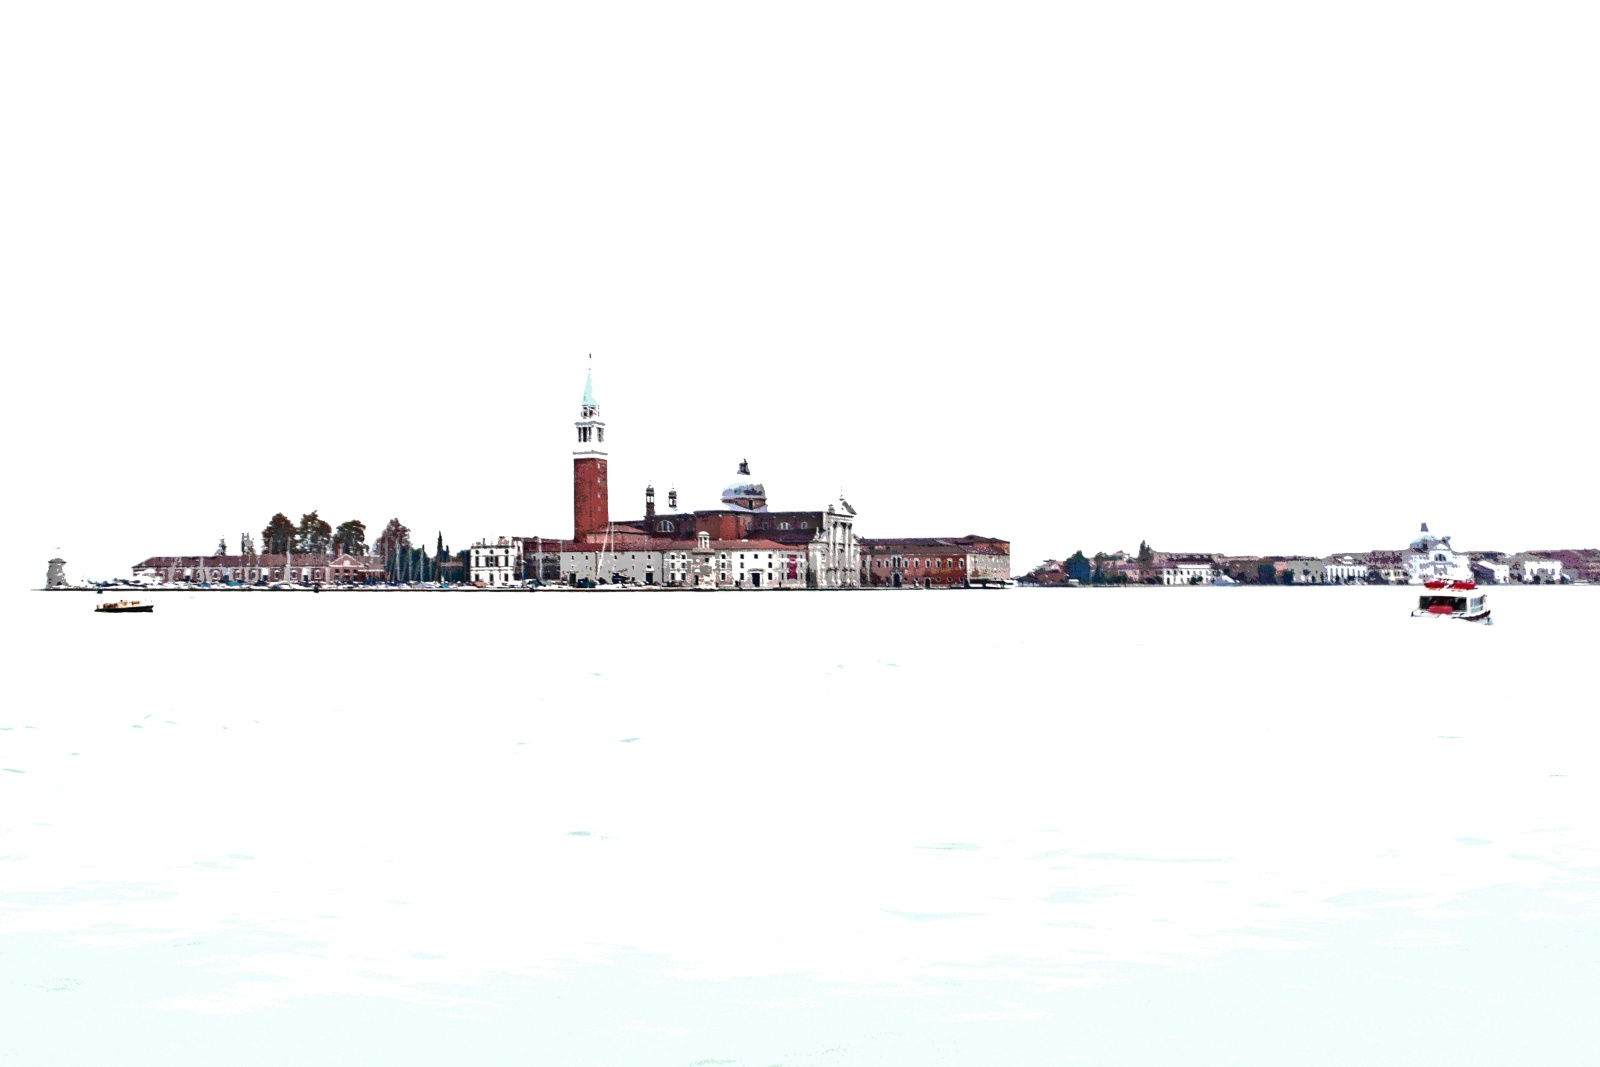 Venezia sovraesposta